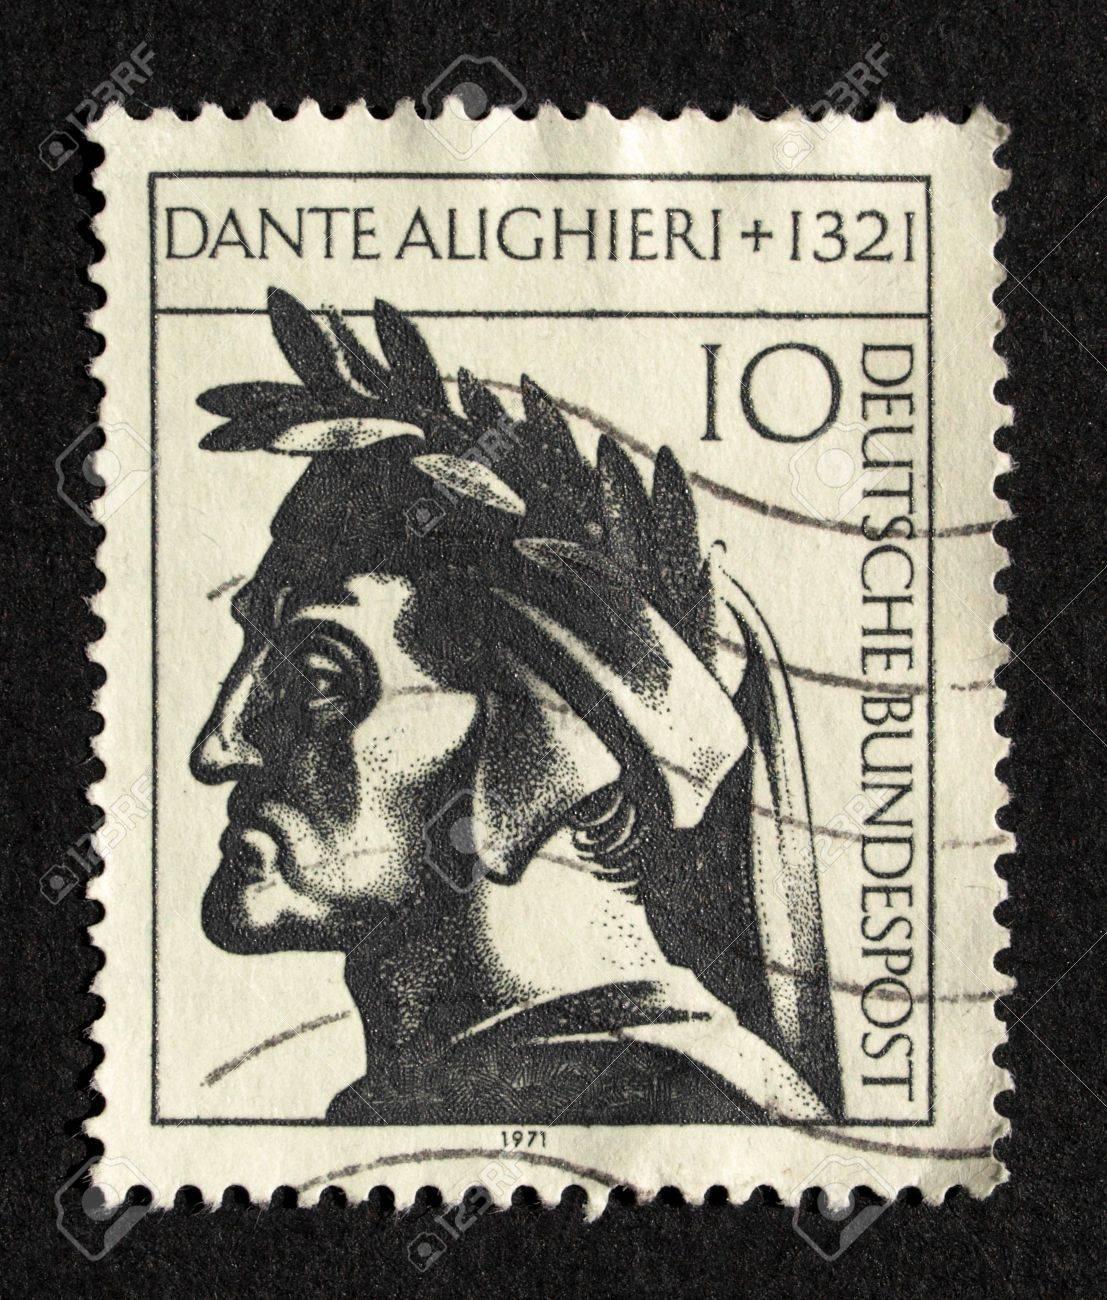 German Stamp With Italian Poet Dante Alighieri Stock Photo